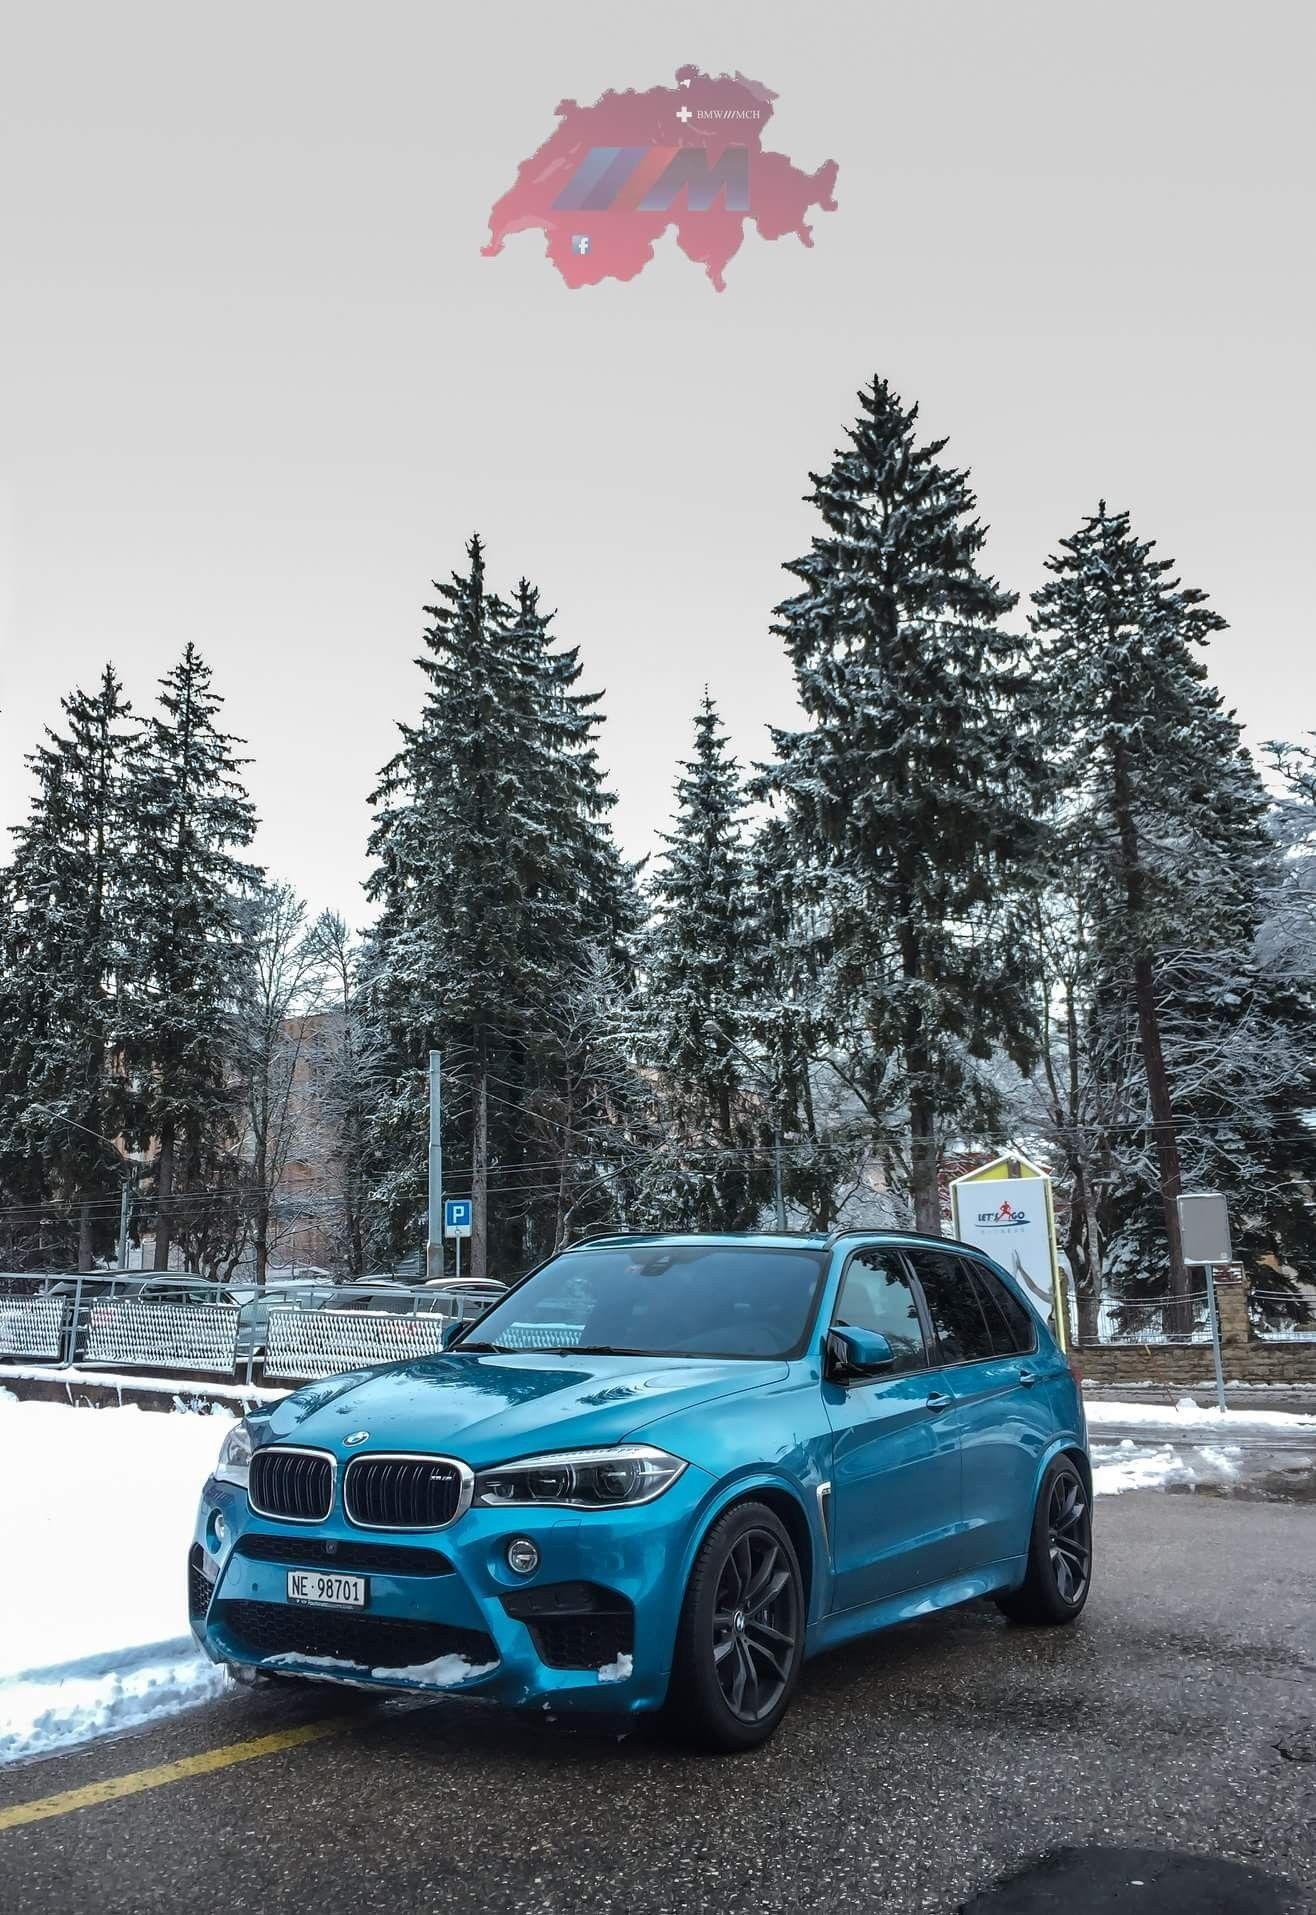 BMW F85 X5M blue | Bmw | Bmw suv, Bmw x5 m, Bmw x5 sport